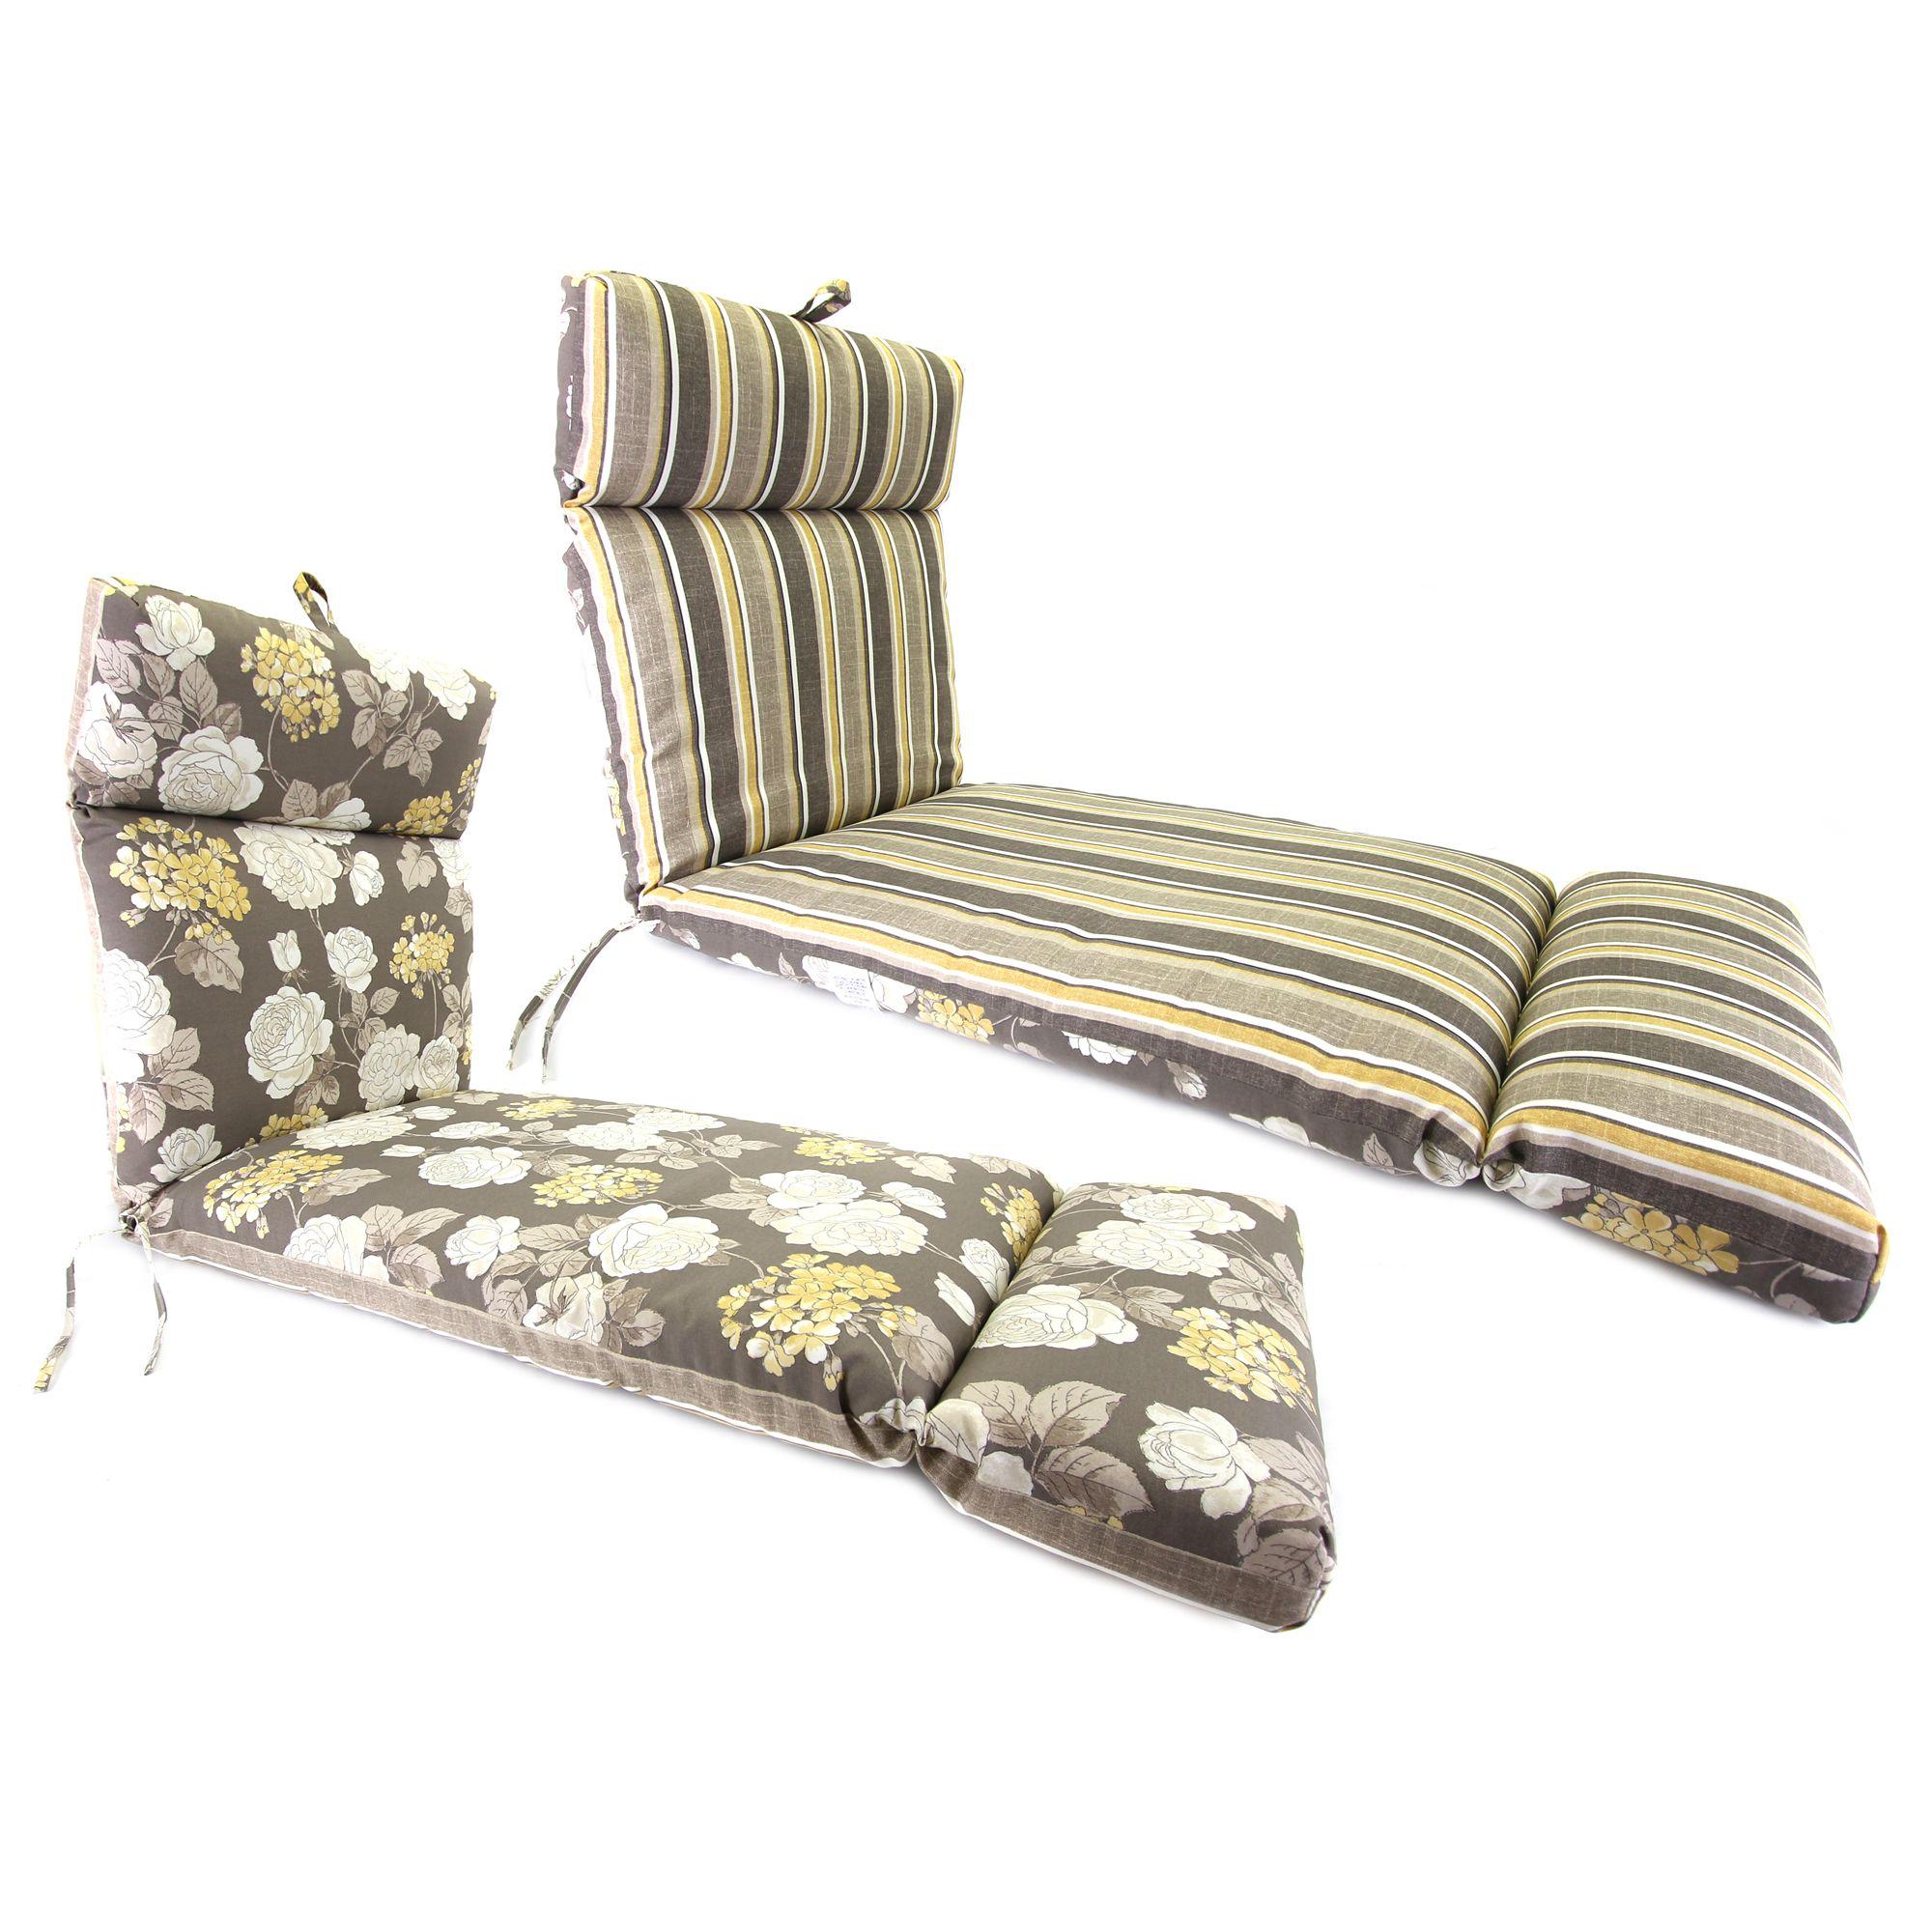 Jordan Manufacturing Co., Inc. Vivienne/Brandy Stripe Putty French Edge Chaise Cushion